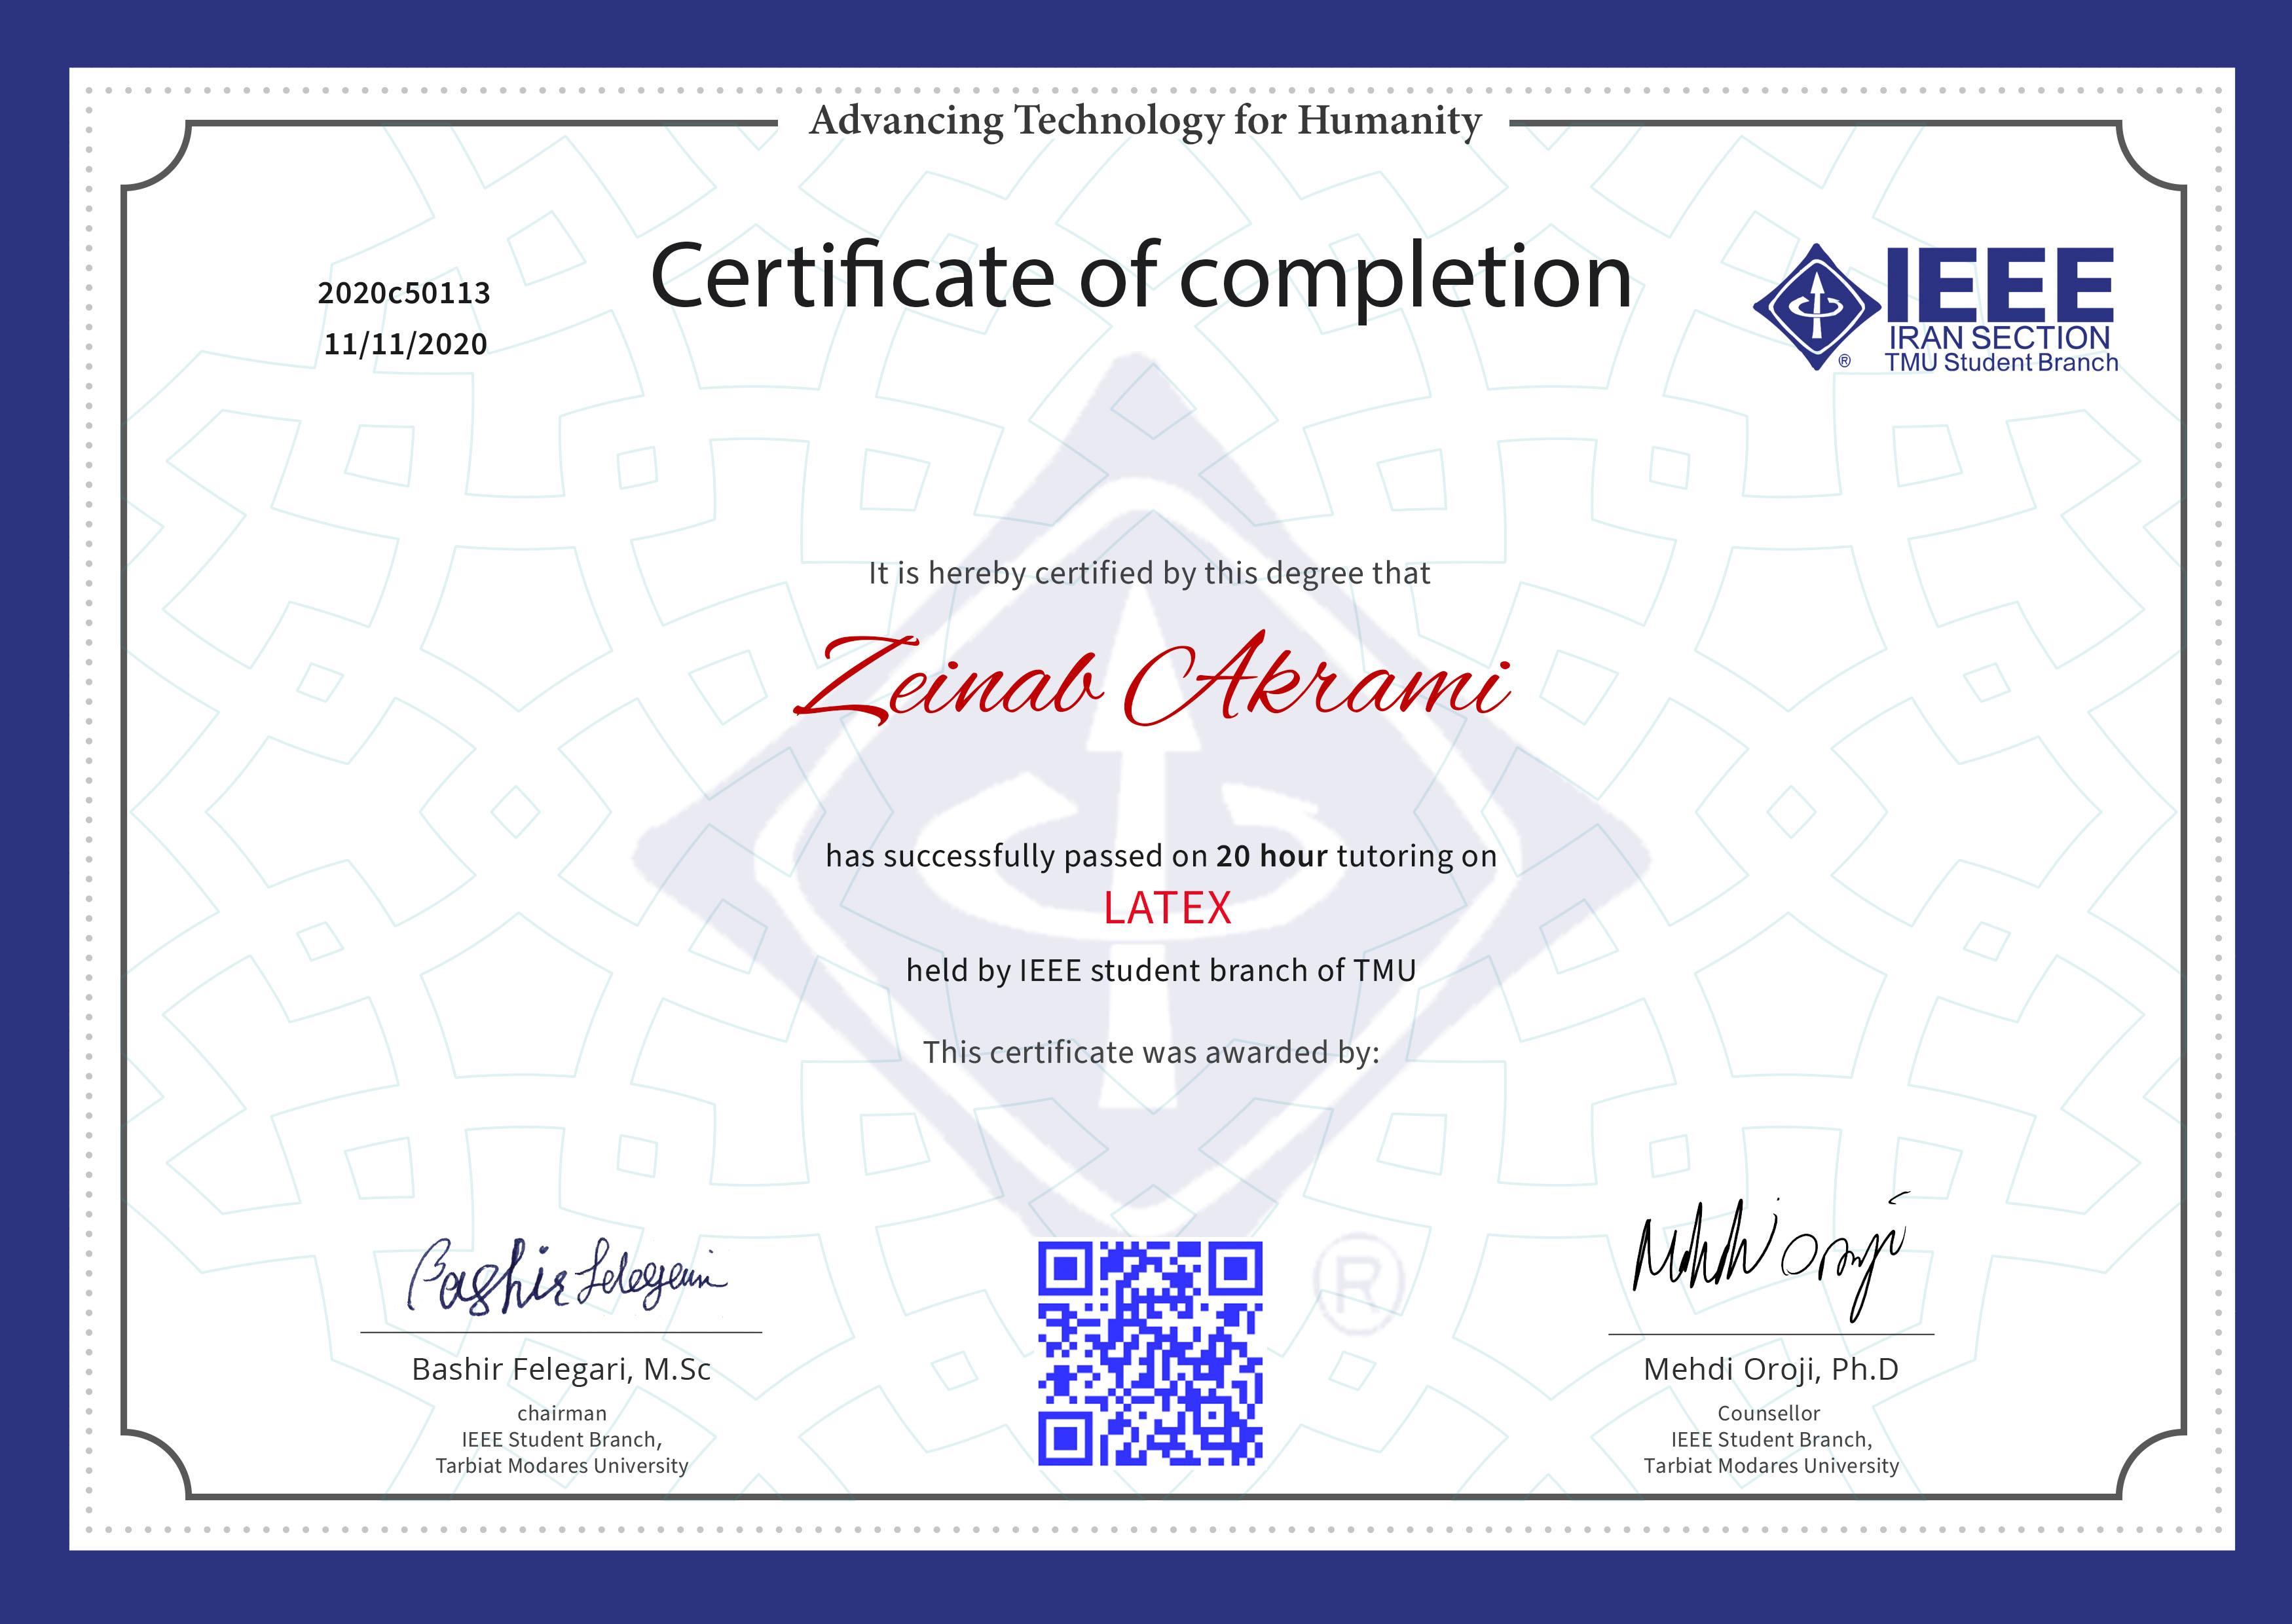 Zeinab Akrami